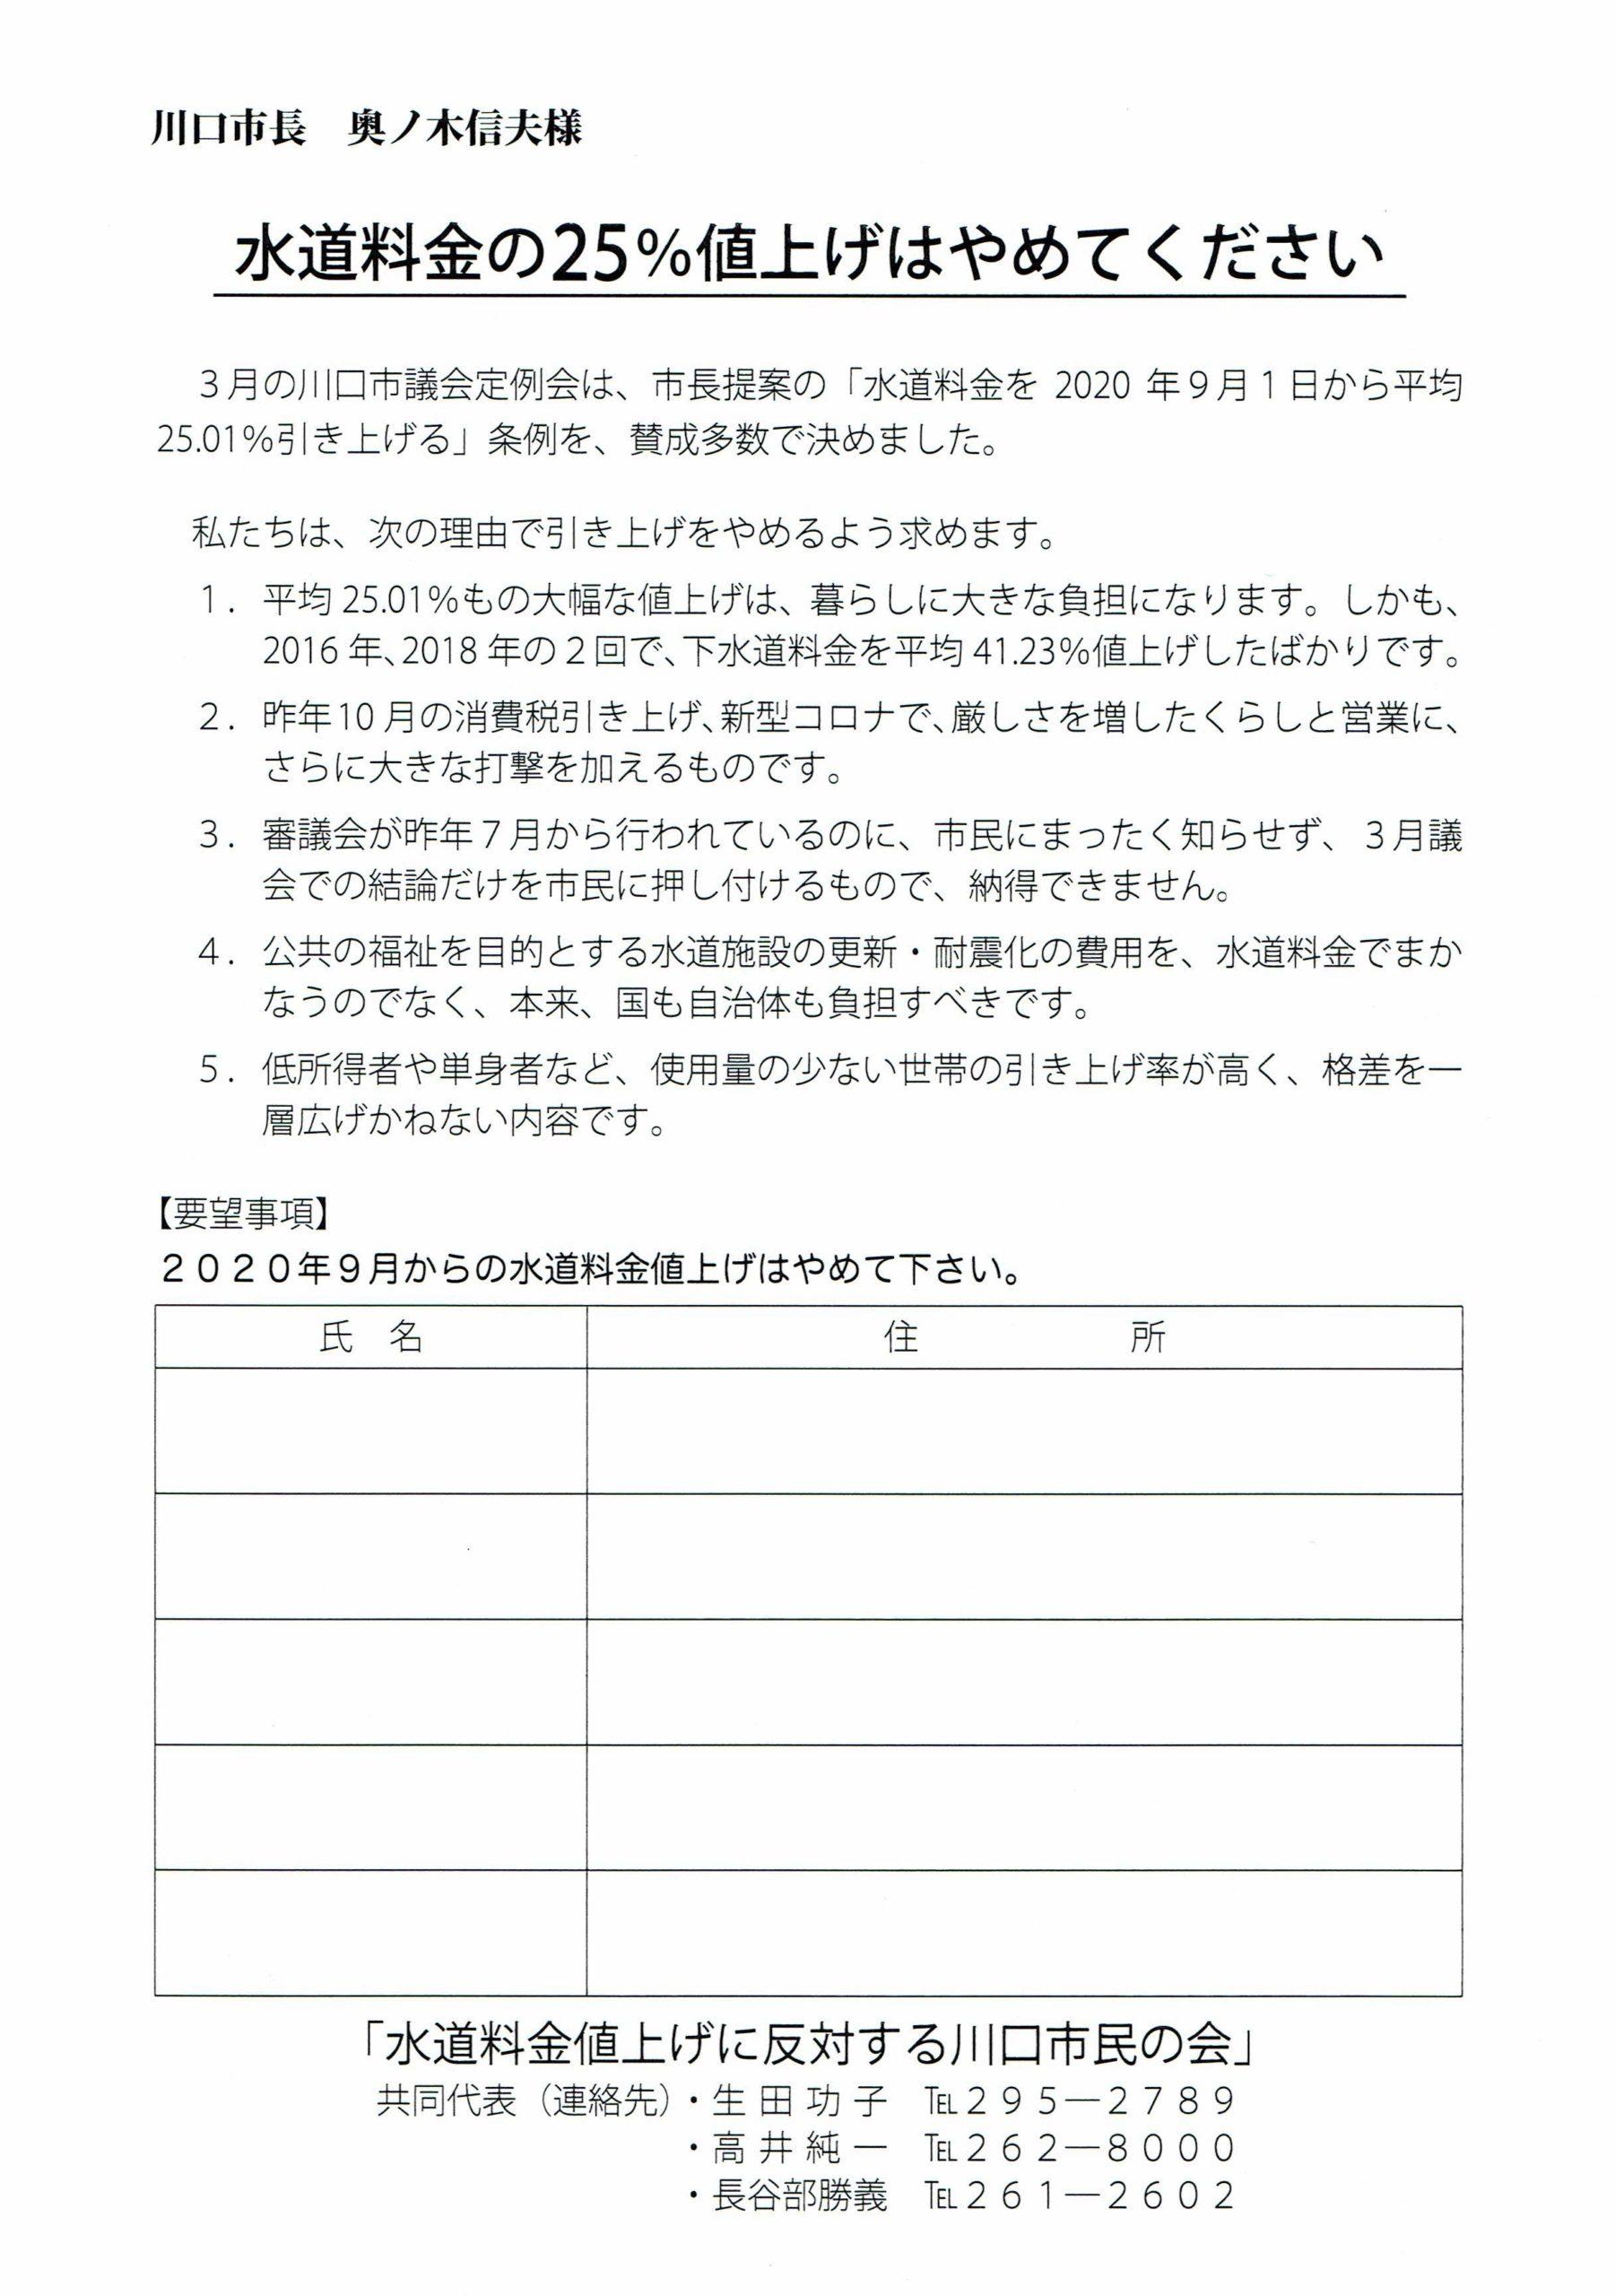 suidouryo-neage-hanntai|syomei-kawagugchi